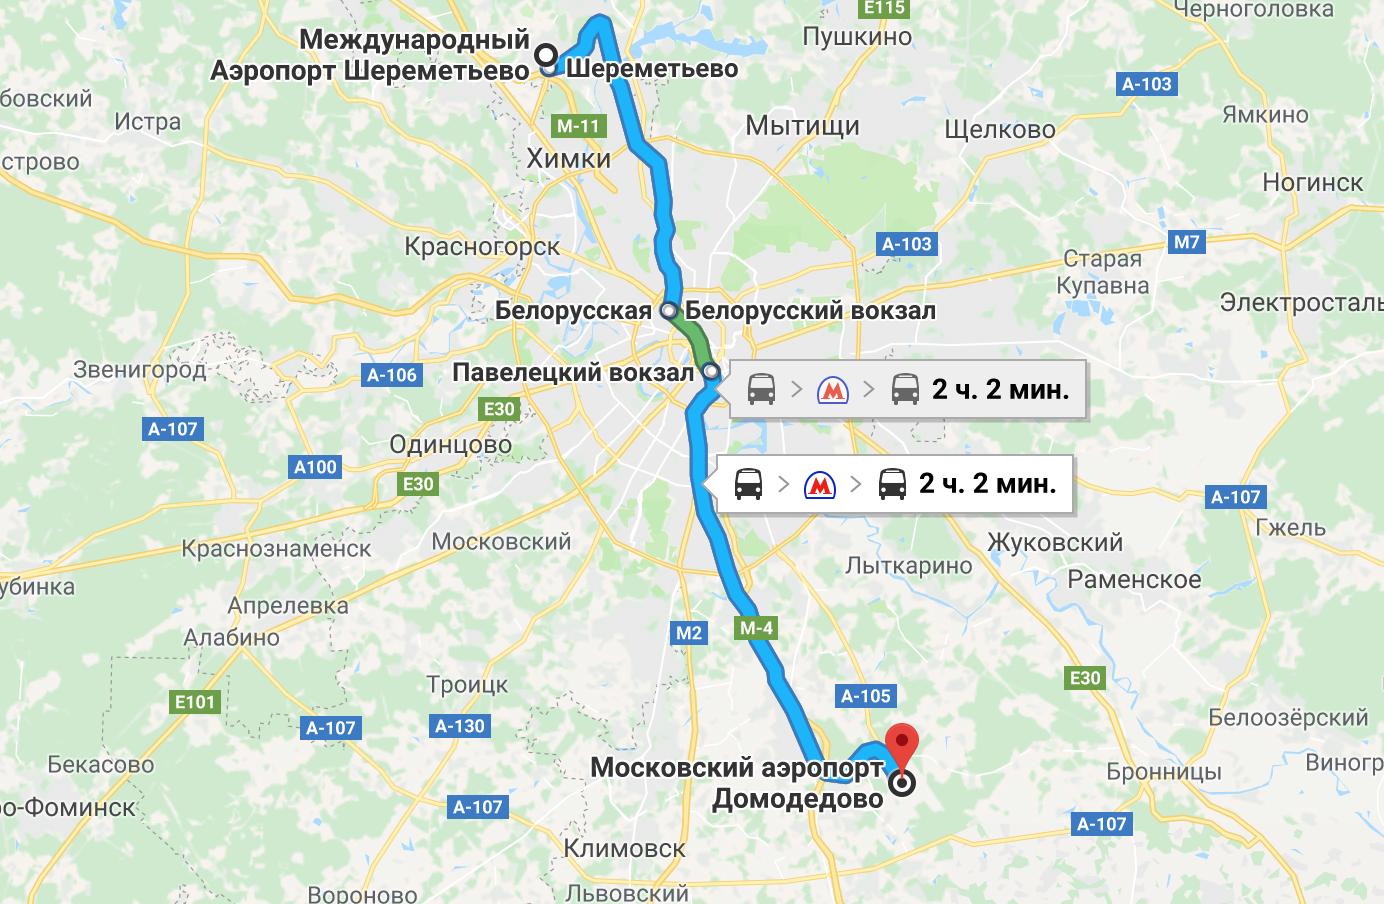 Из Шереметьево маршрут в Домодедово